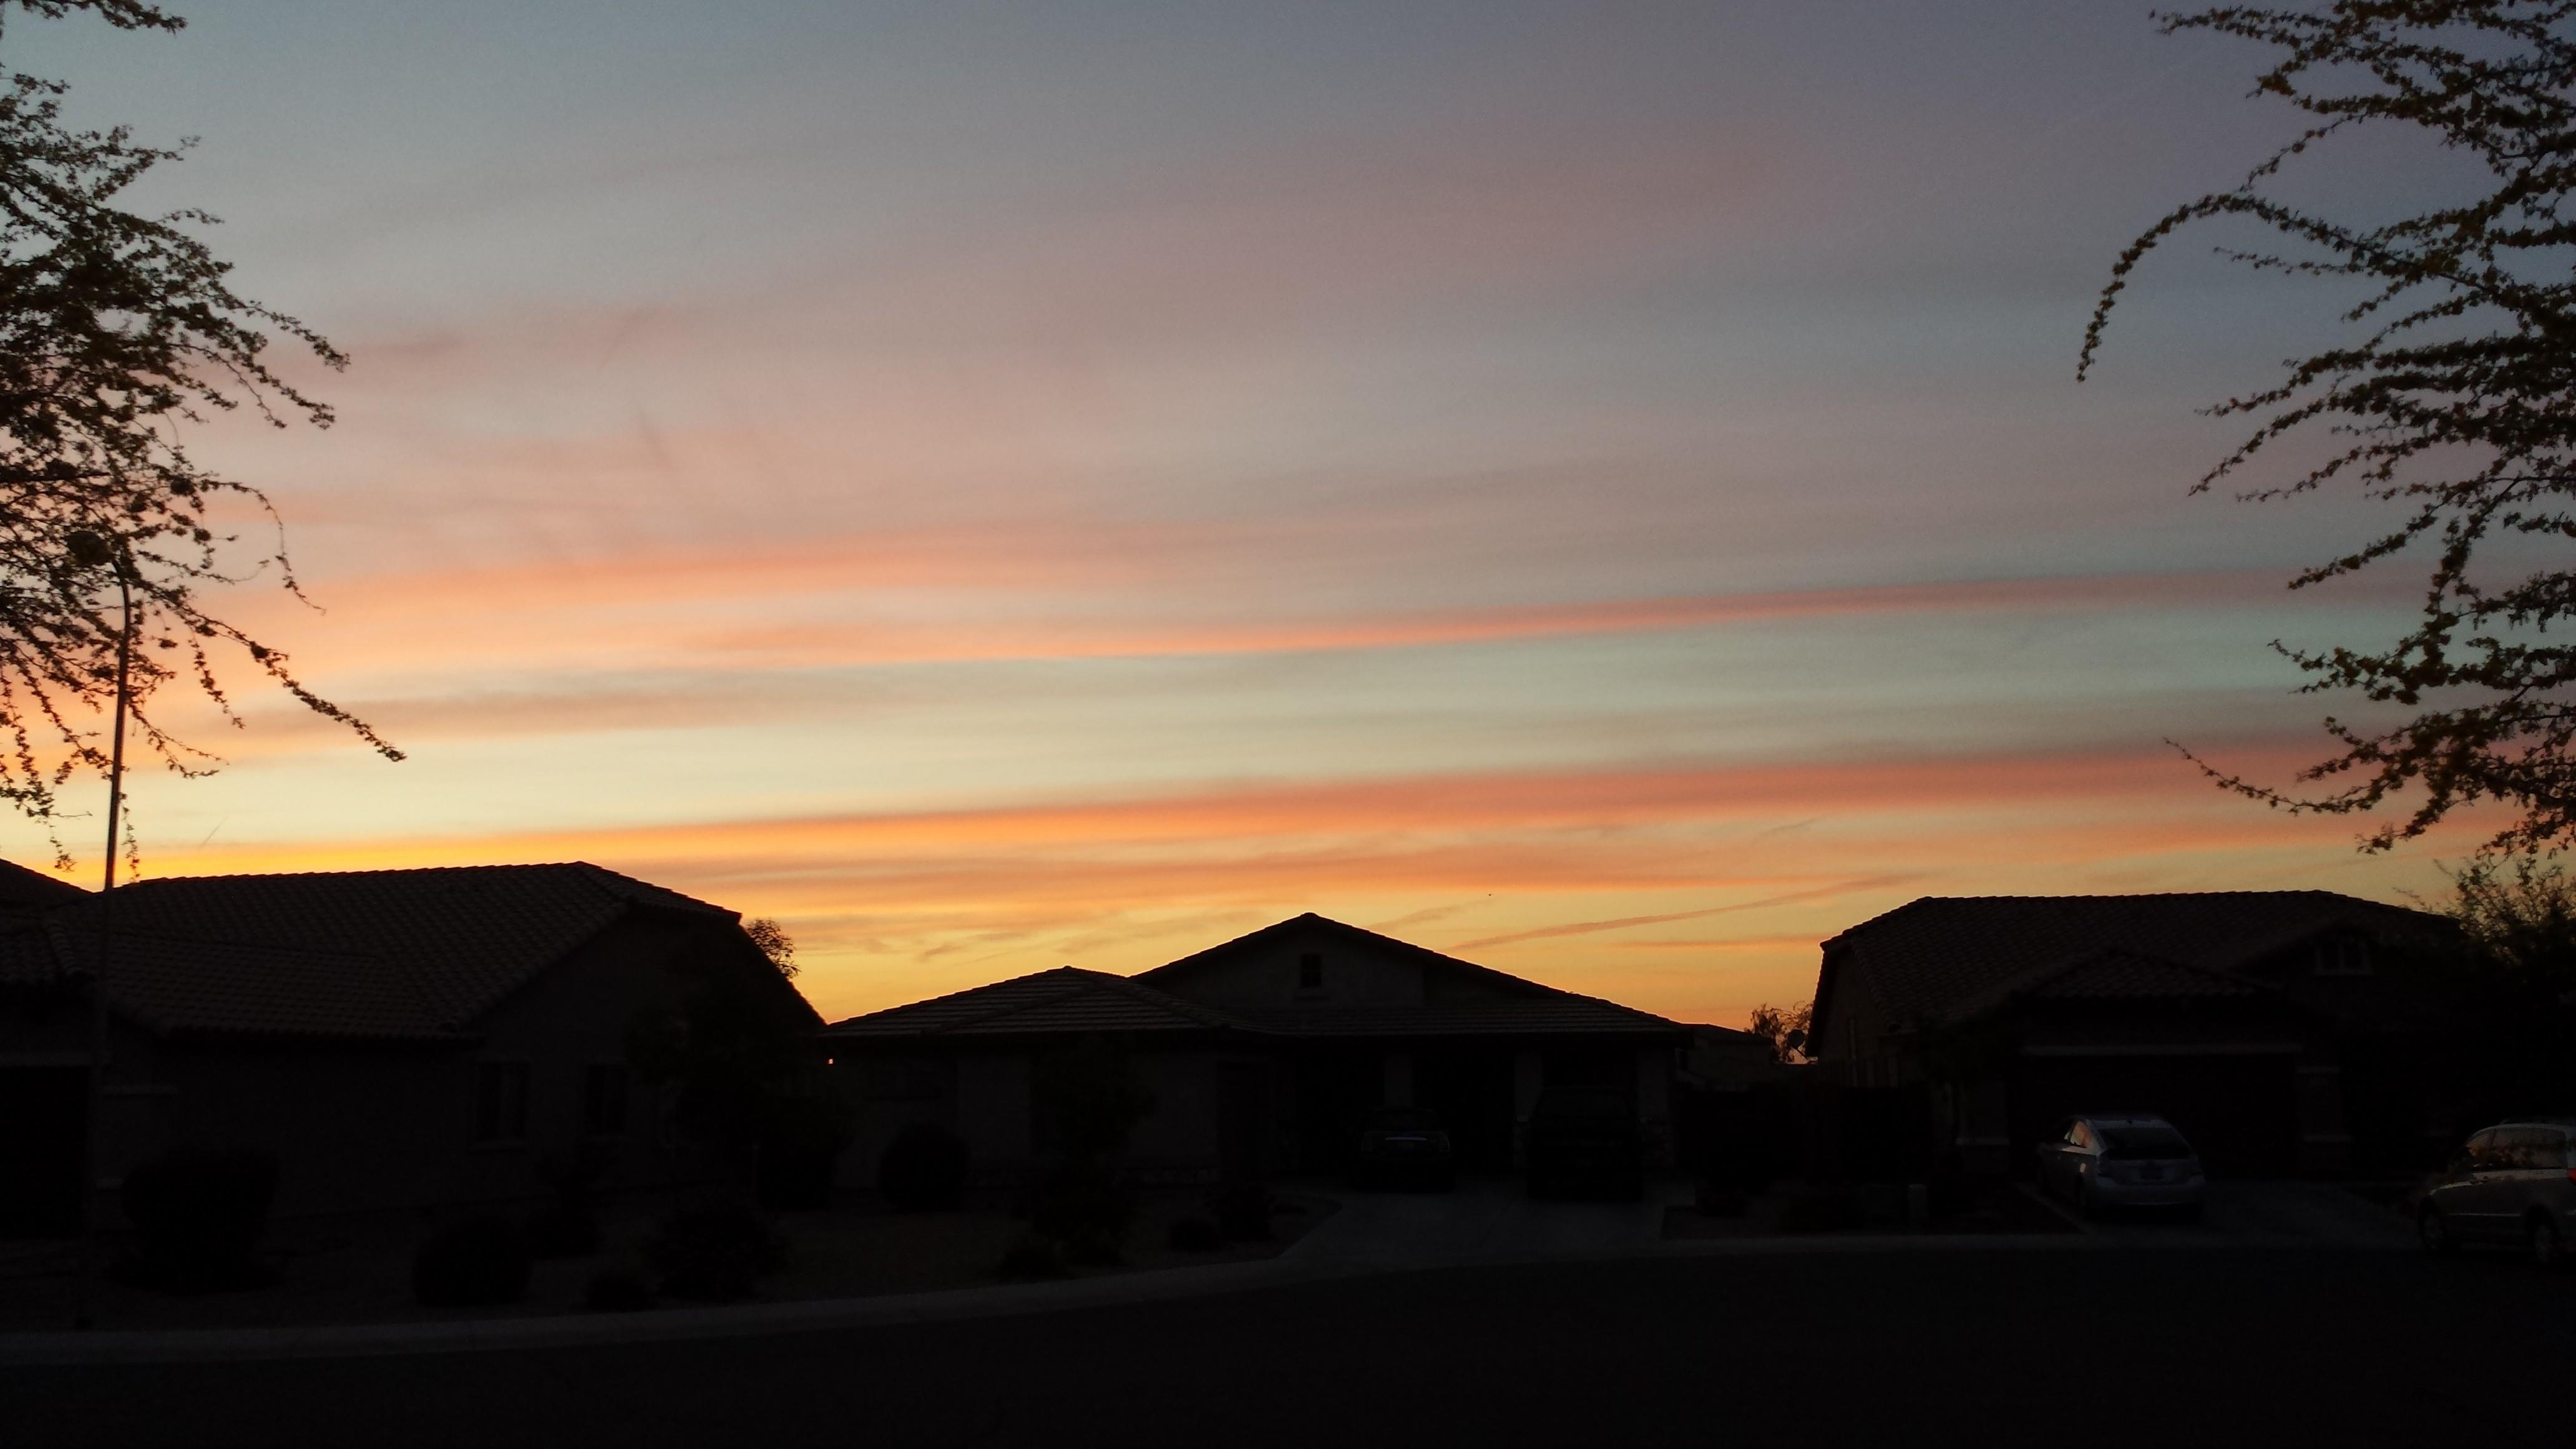 Sunset in Laveen, Arizona